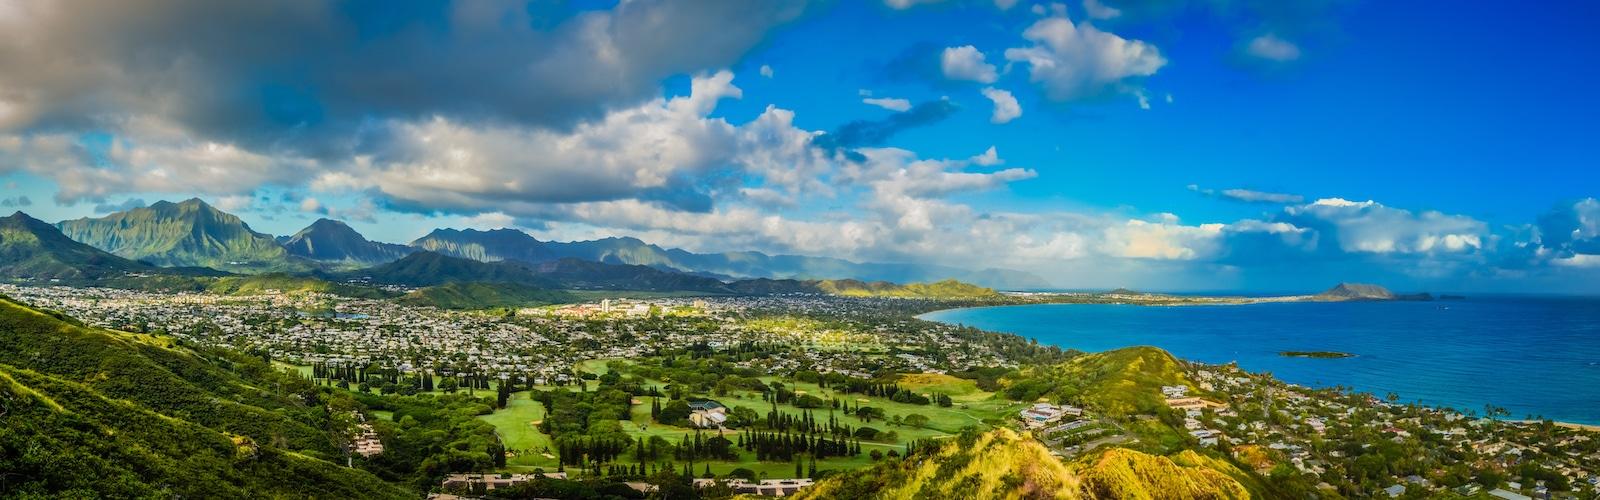 Introduction to Oahu, Lanikai Pillboxes Panorama, Oahu, Hawaii